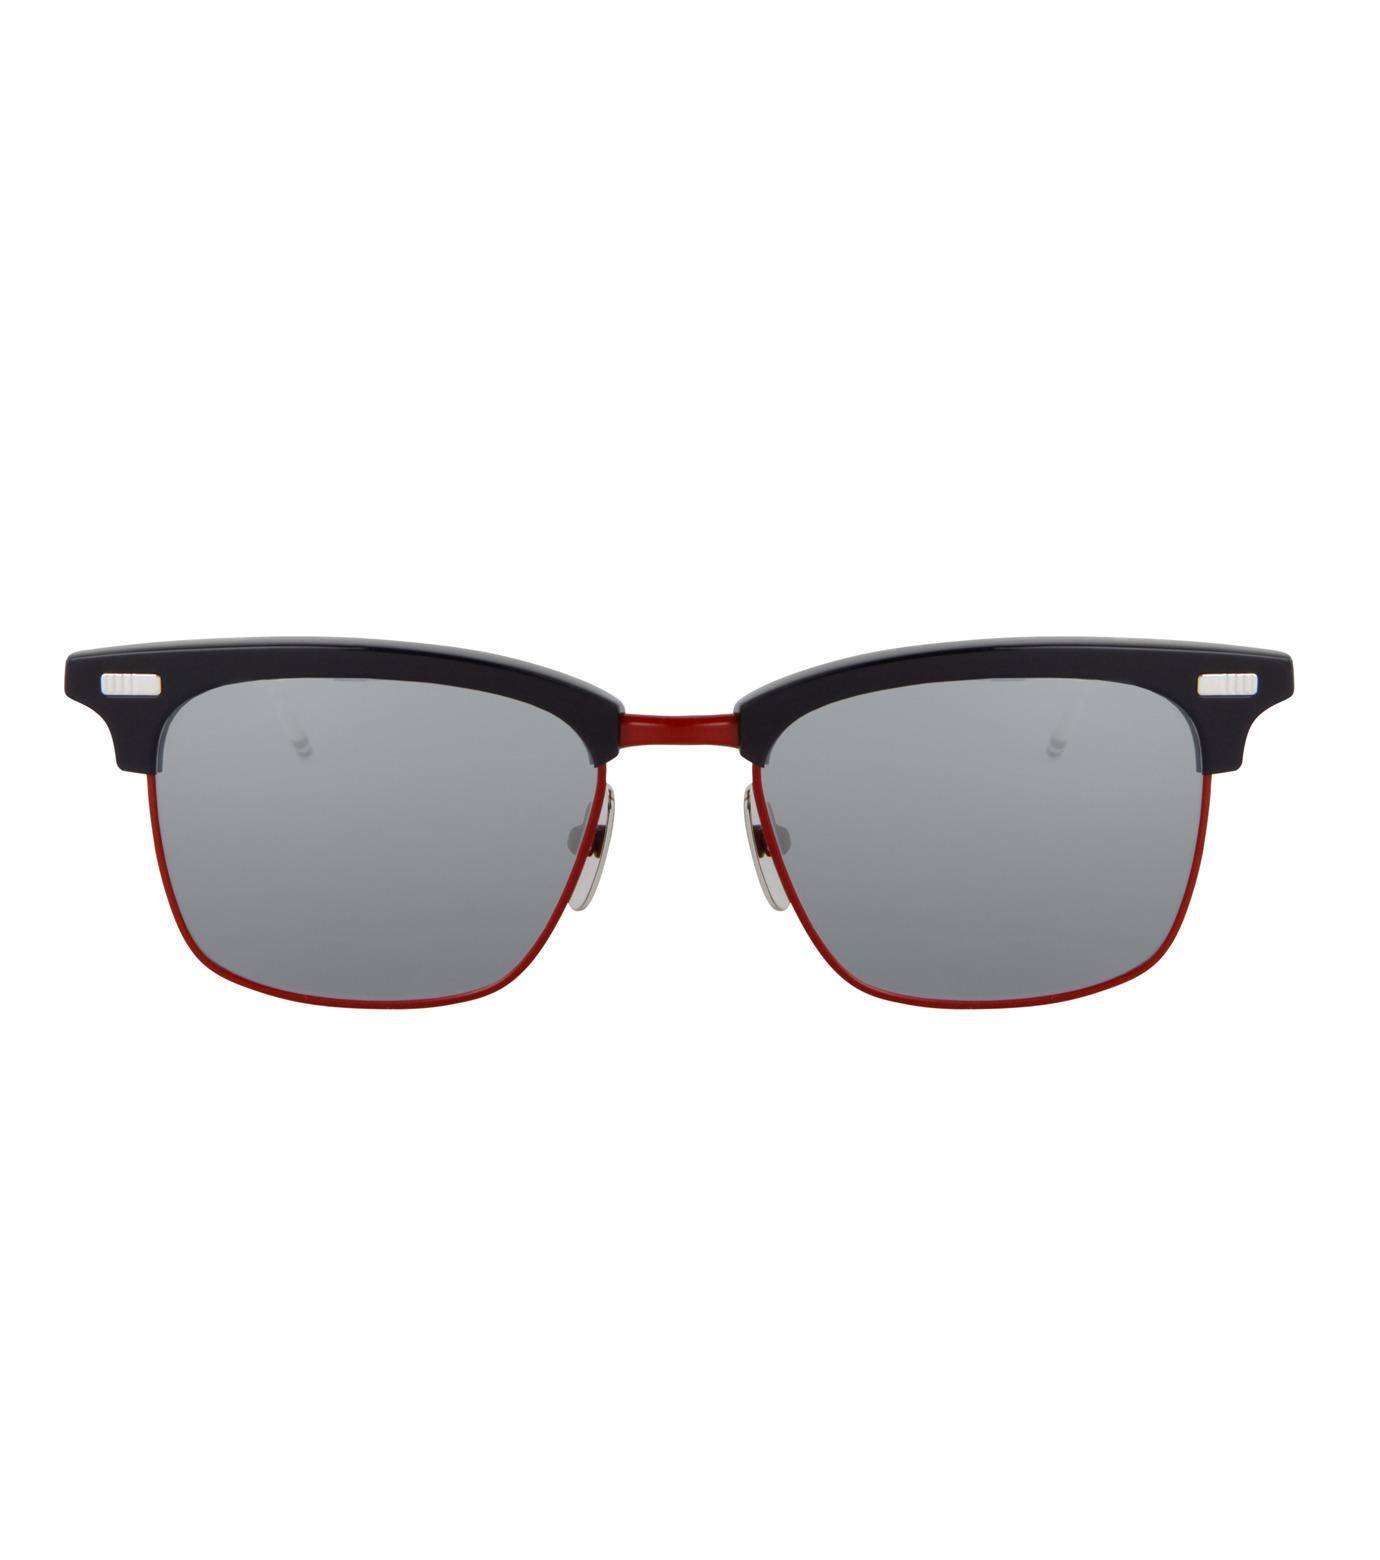 Thom Browne Eye Wear(トム・ブラウン・アイウェア)のtricolore wellington-NAVY(アイウェア/eyewear)-TB-711-D-93 拡大詳細画像3